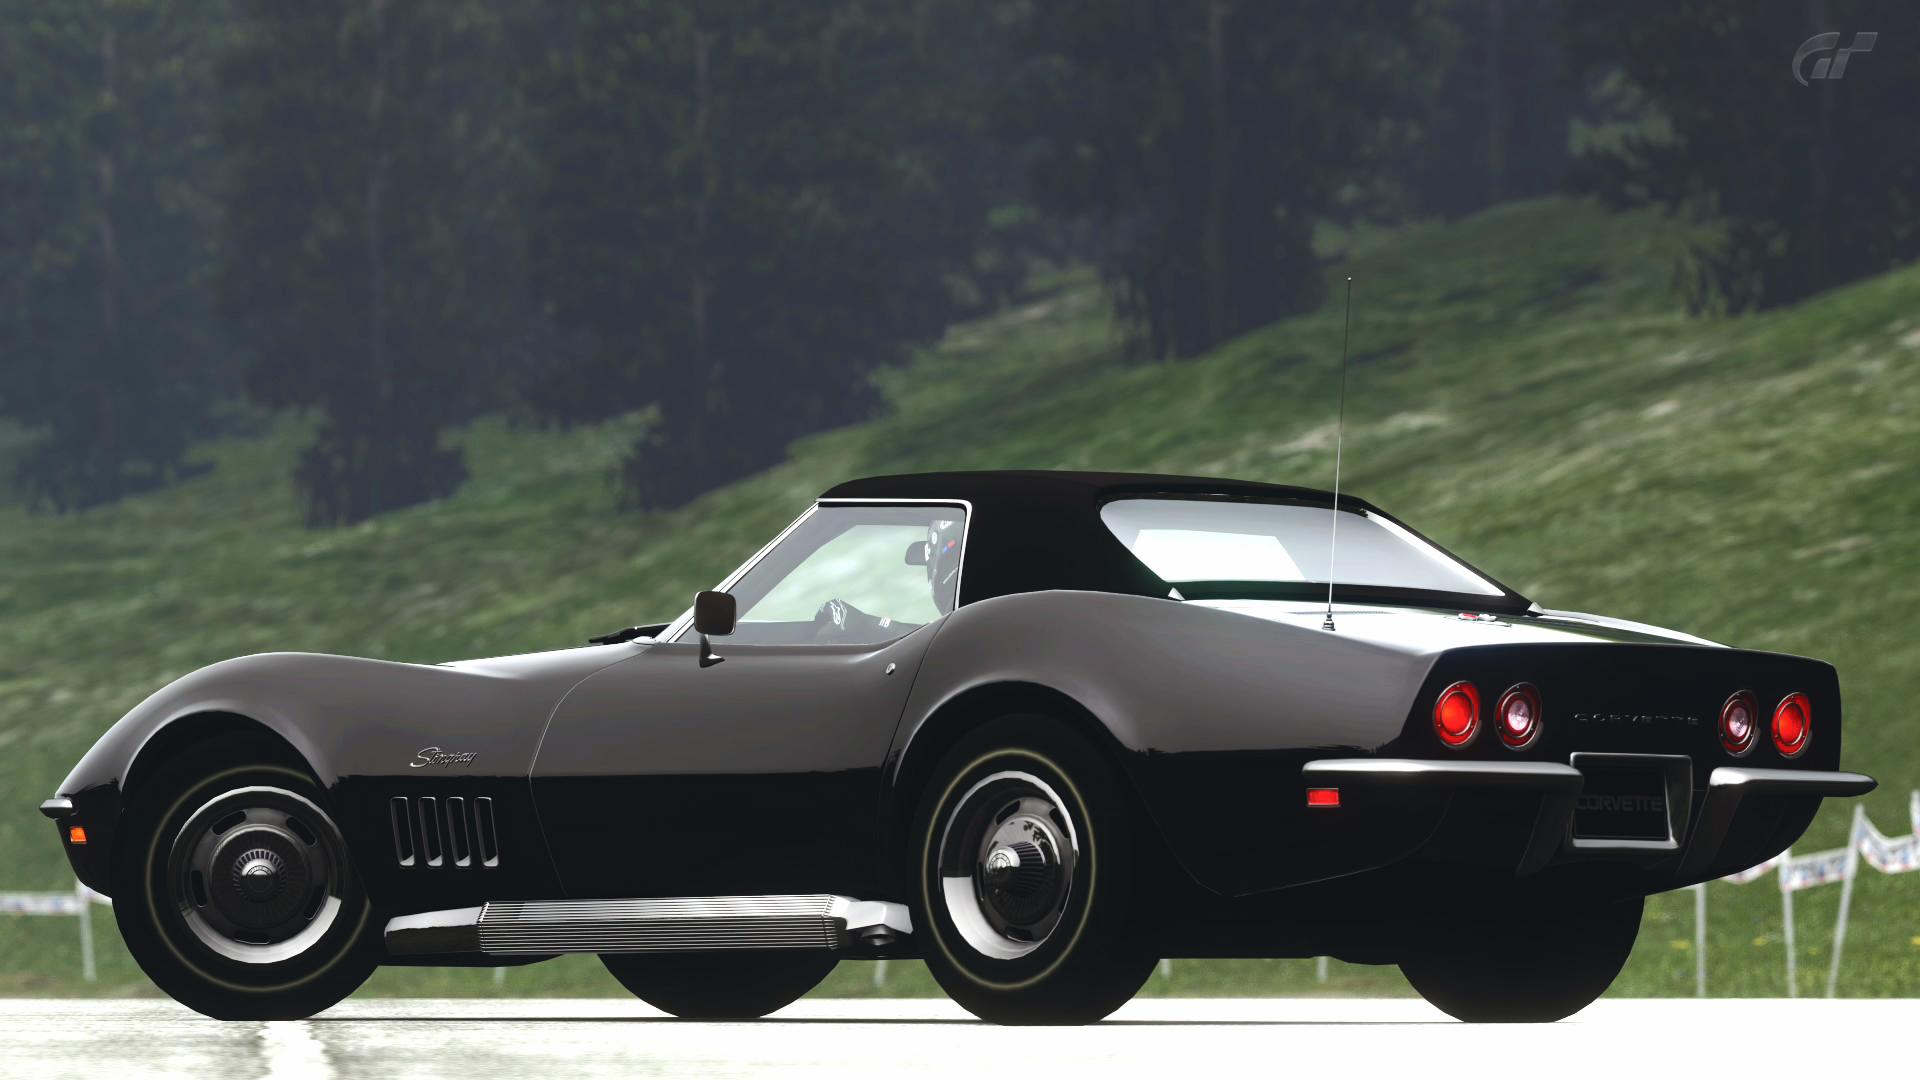 1969 corvette stingray wallpaper stingray wallpaper 1969. Cars Review. Best American Auto & Cars Review